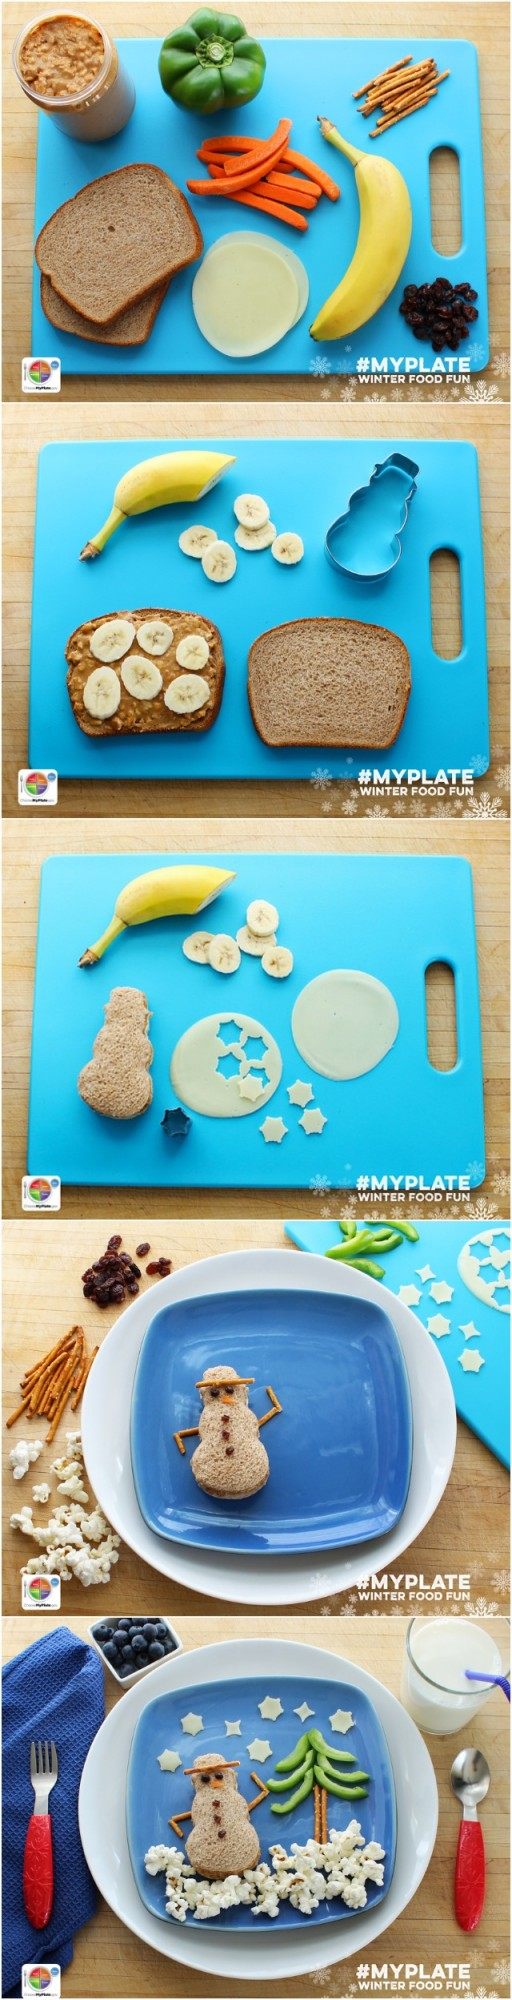 How to make an Edible MyPlate Snowman